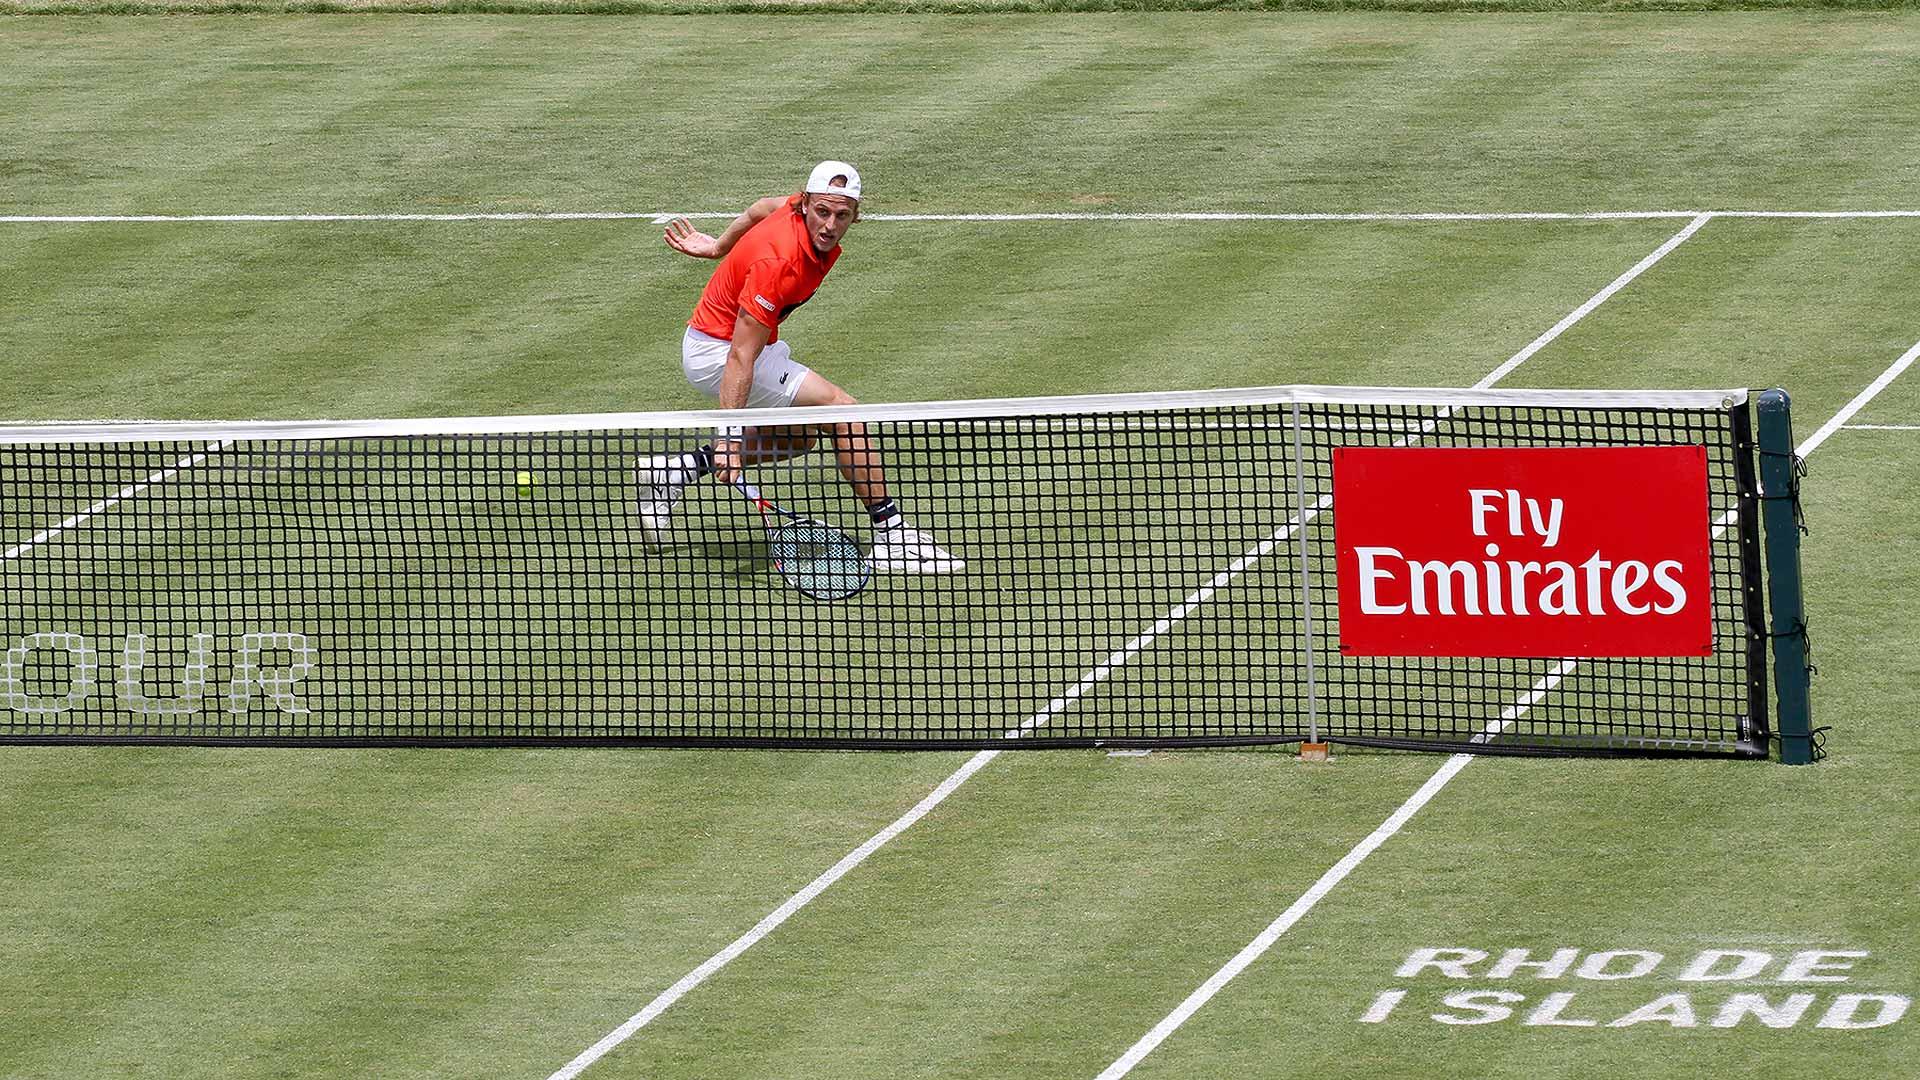 .@deniskudla wins an all-American battle to reach R2 at @TennisHalloFame. Read: https://t.co/vR4yZORehi https://t.co/xSChUUInlq